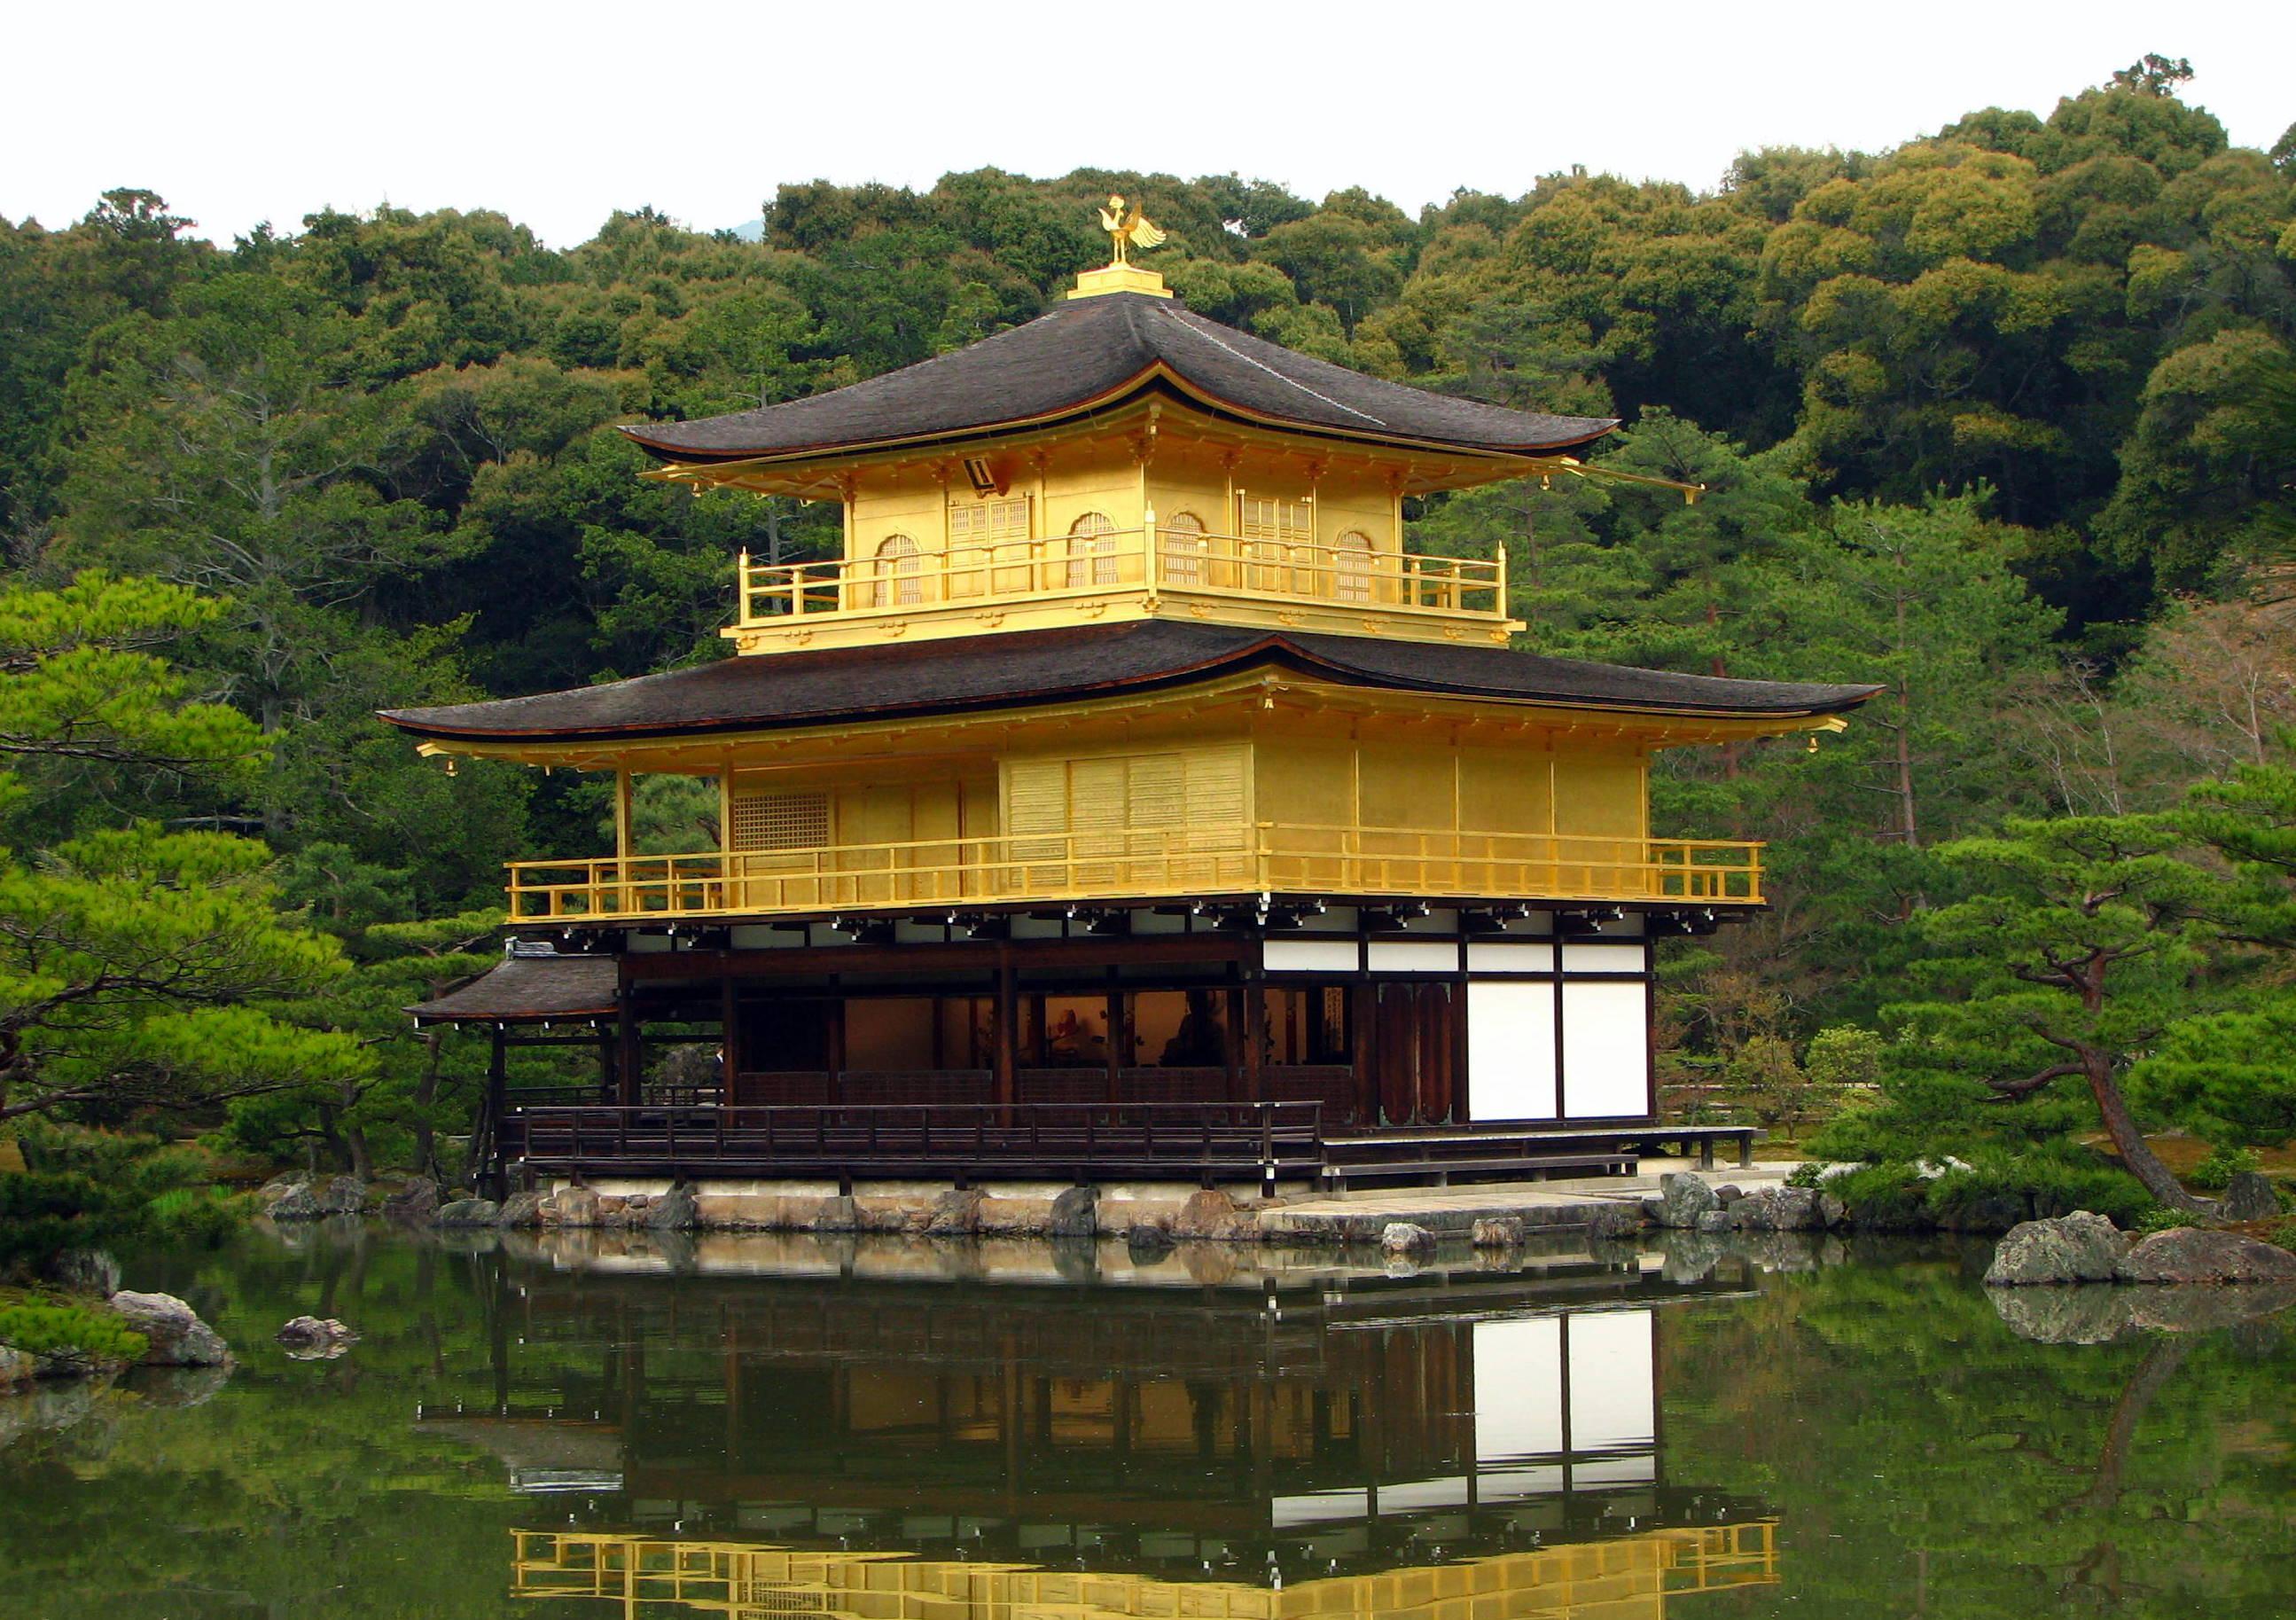 http://upload.wikimedia.org/wikipedia/commons/f/f8/Kinkaku-ji_01.jpg